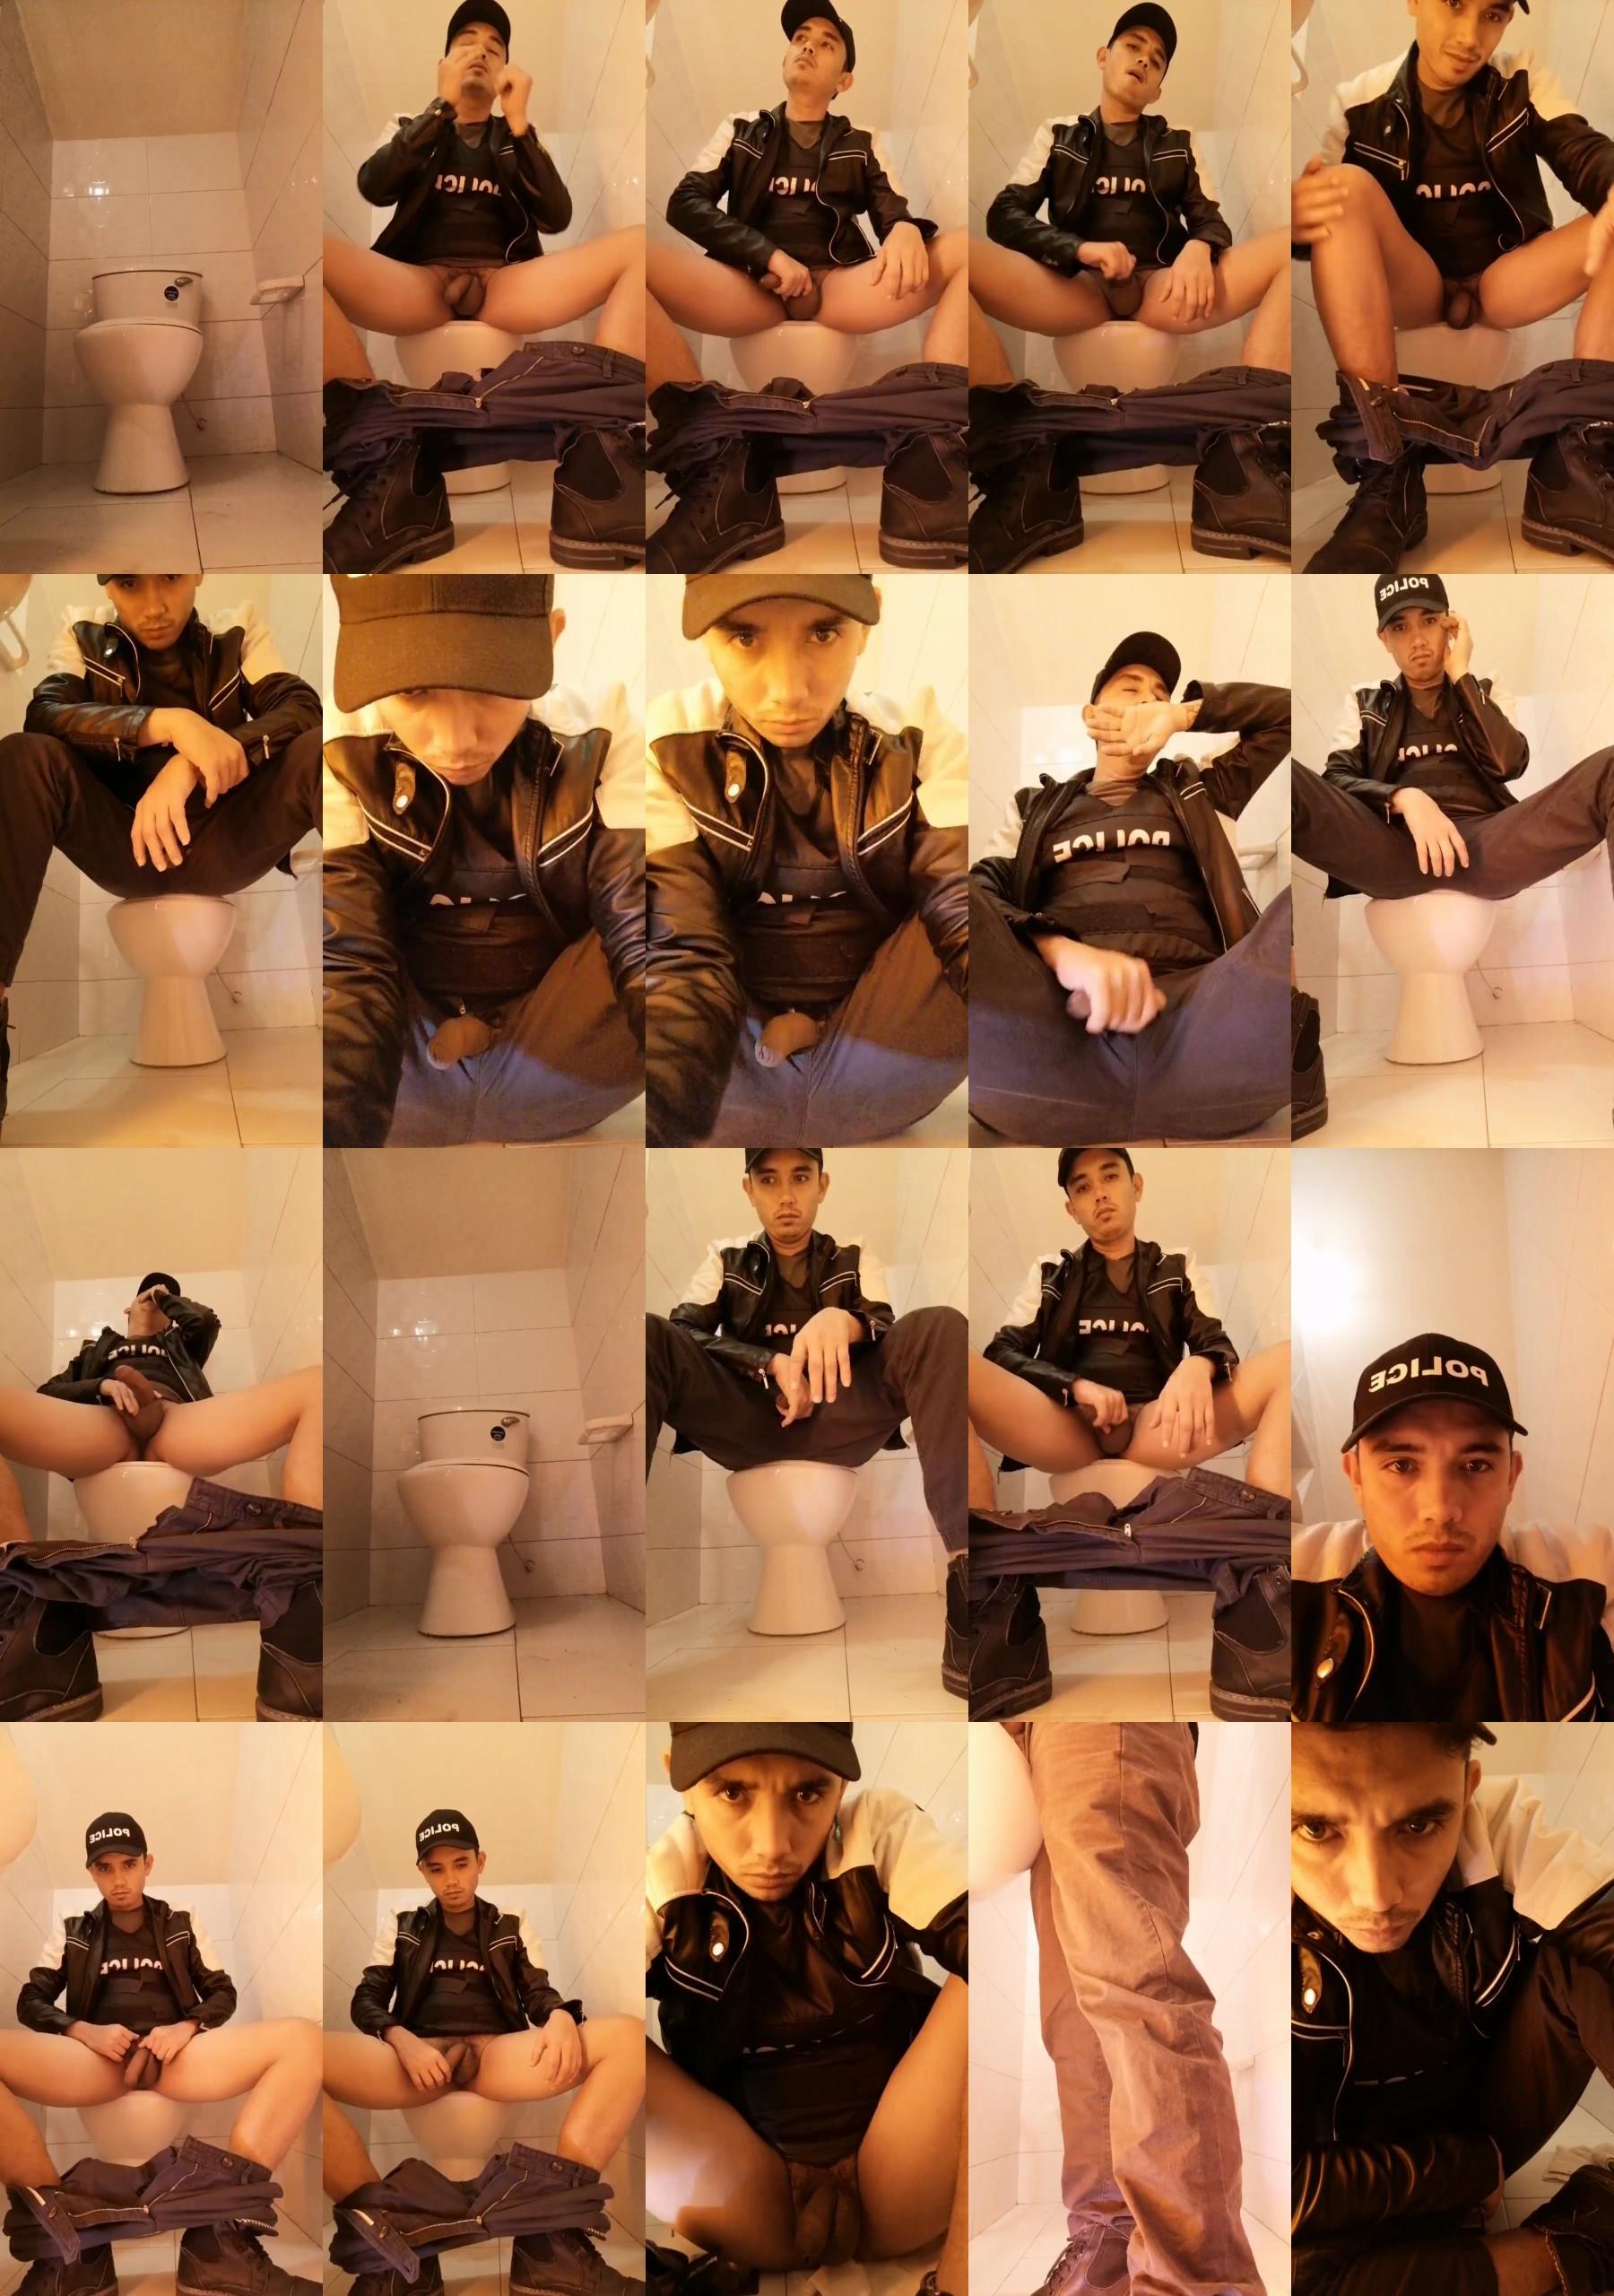 sargento_fiobi Cam4 14-04-2021 Recorded Video Naked